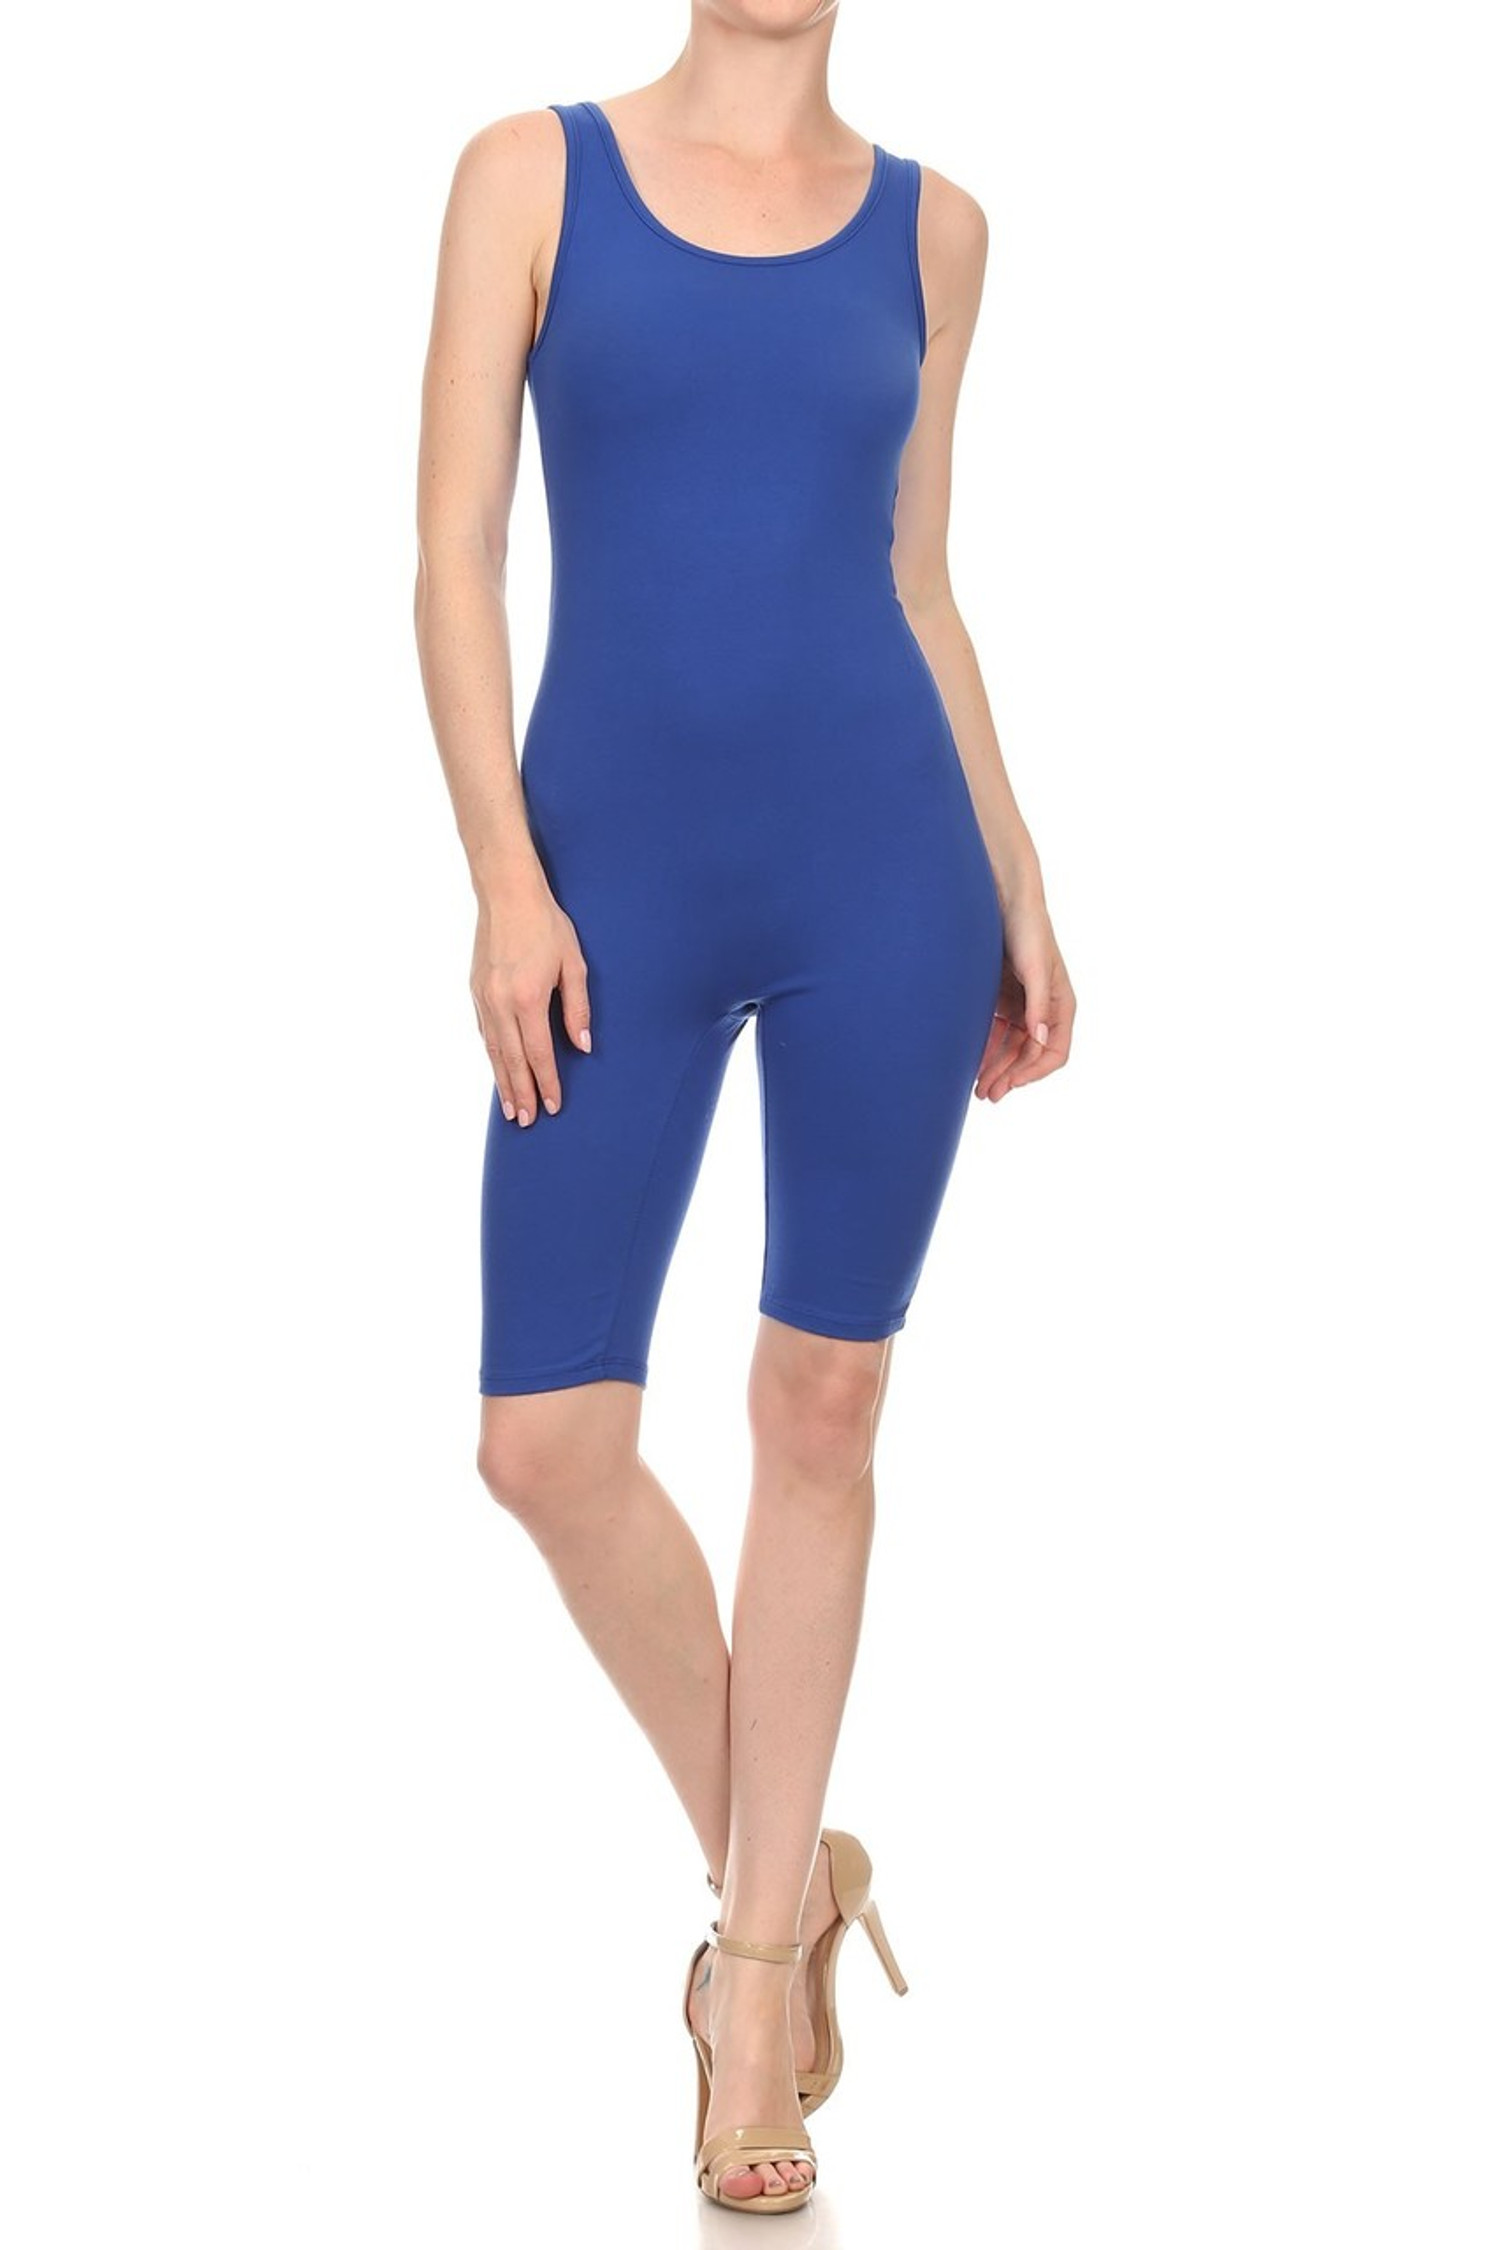 Blue USA Basic Cotton Thigh High Jumpsuit